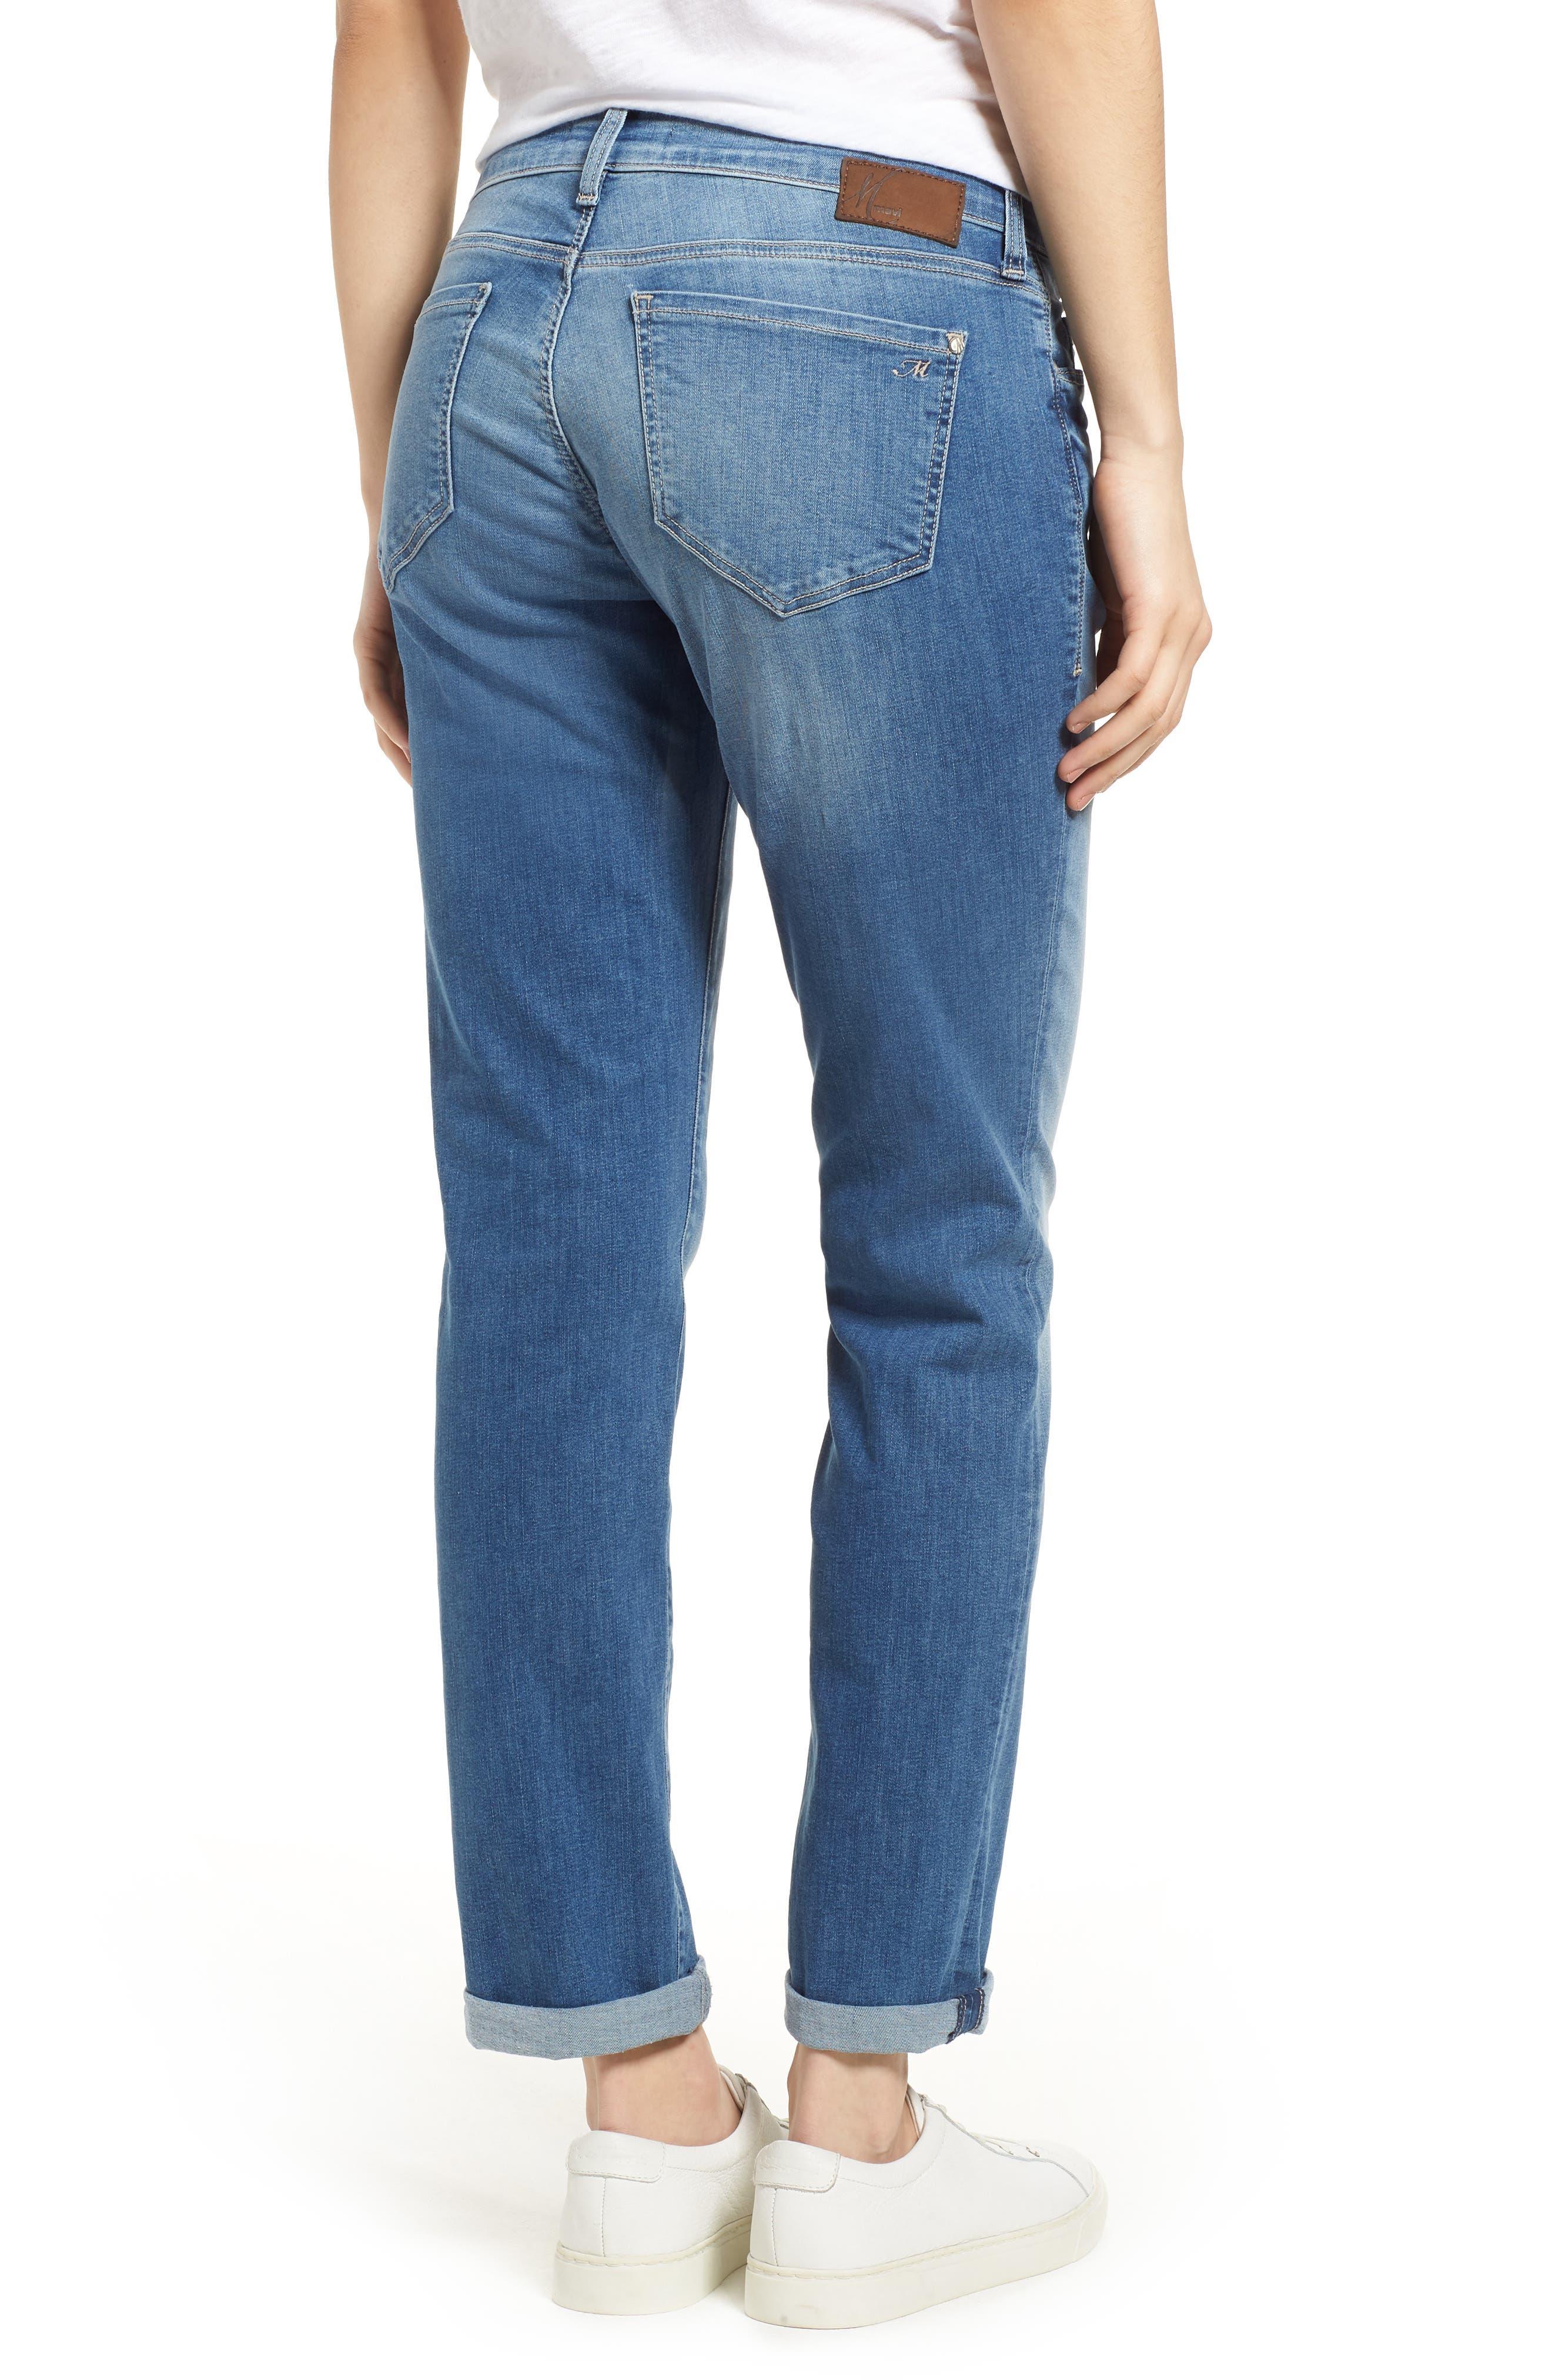 MAVI JEANS, Emma Slim Boyfriend Jeans, Alternate thumbnail 2, color, INDIGO RIPPED NOLITA